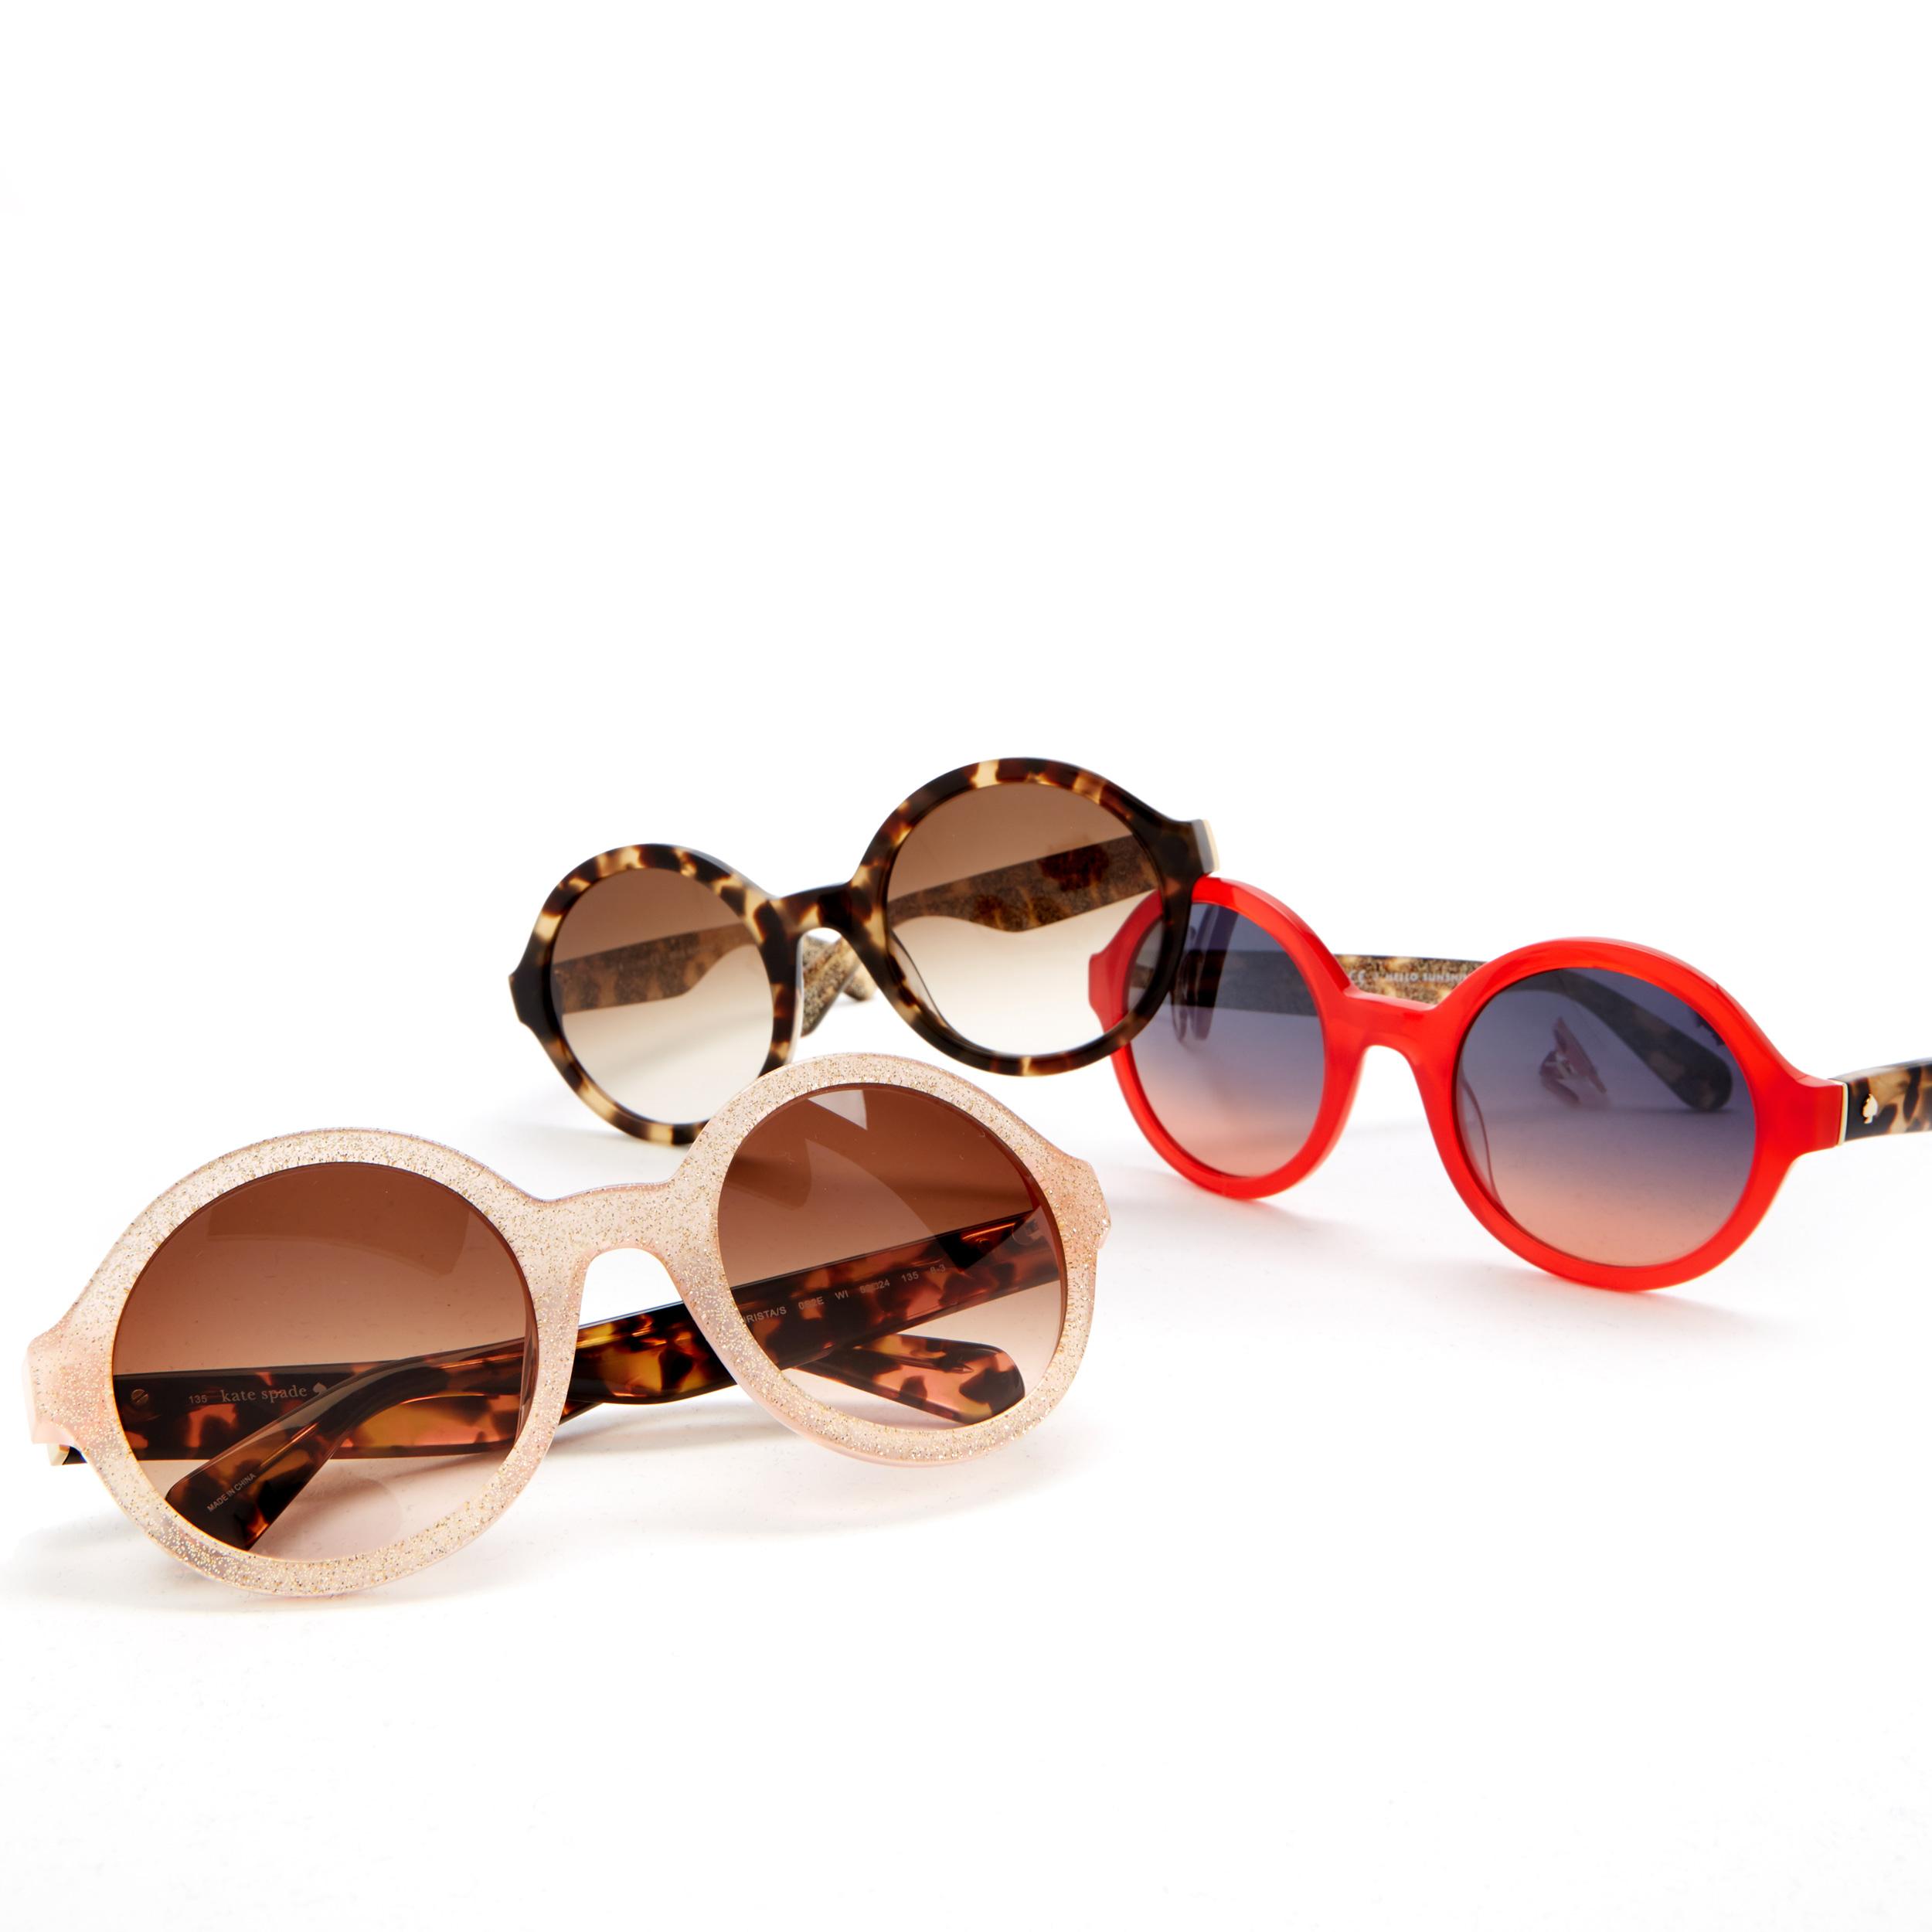 dior-glasses.jpg